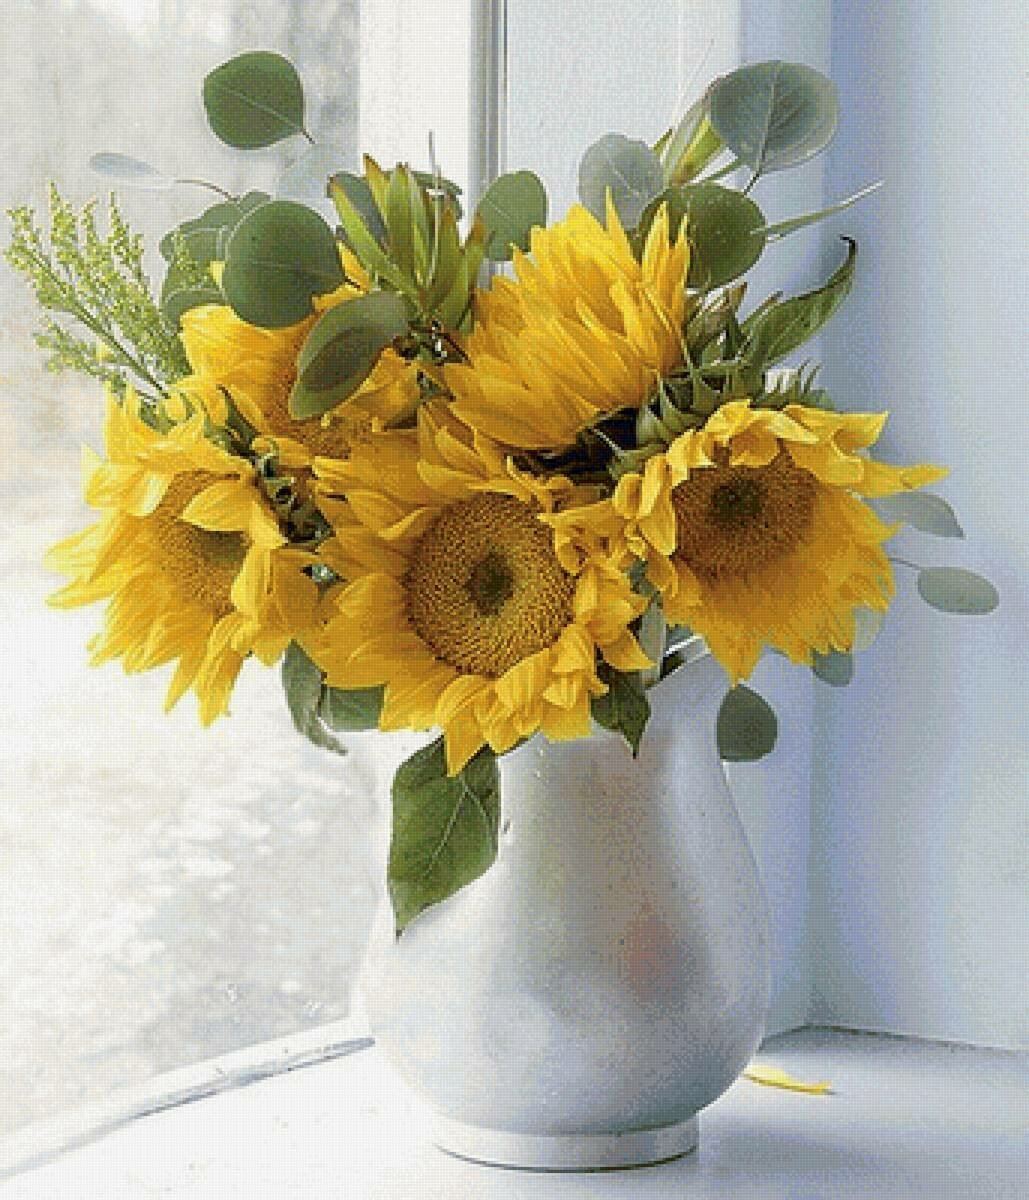 фото картинки цветы подсолнухи в вазах вам